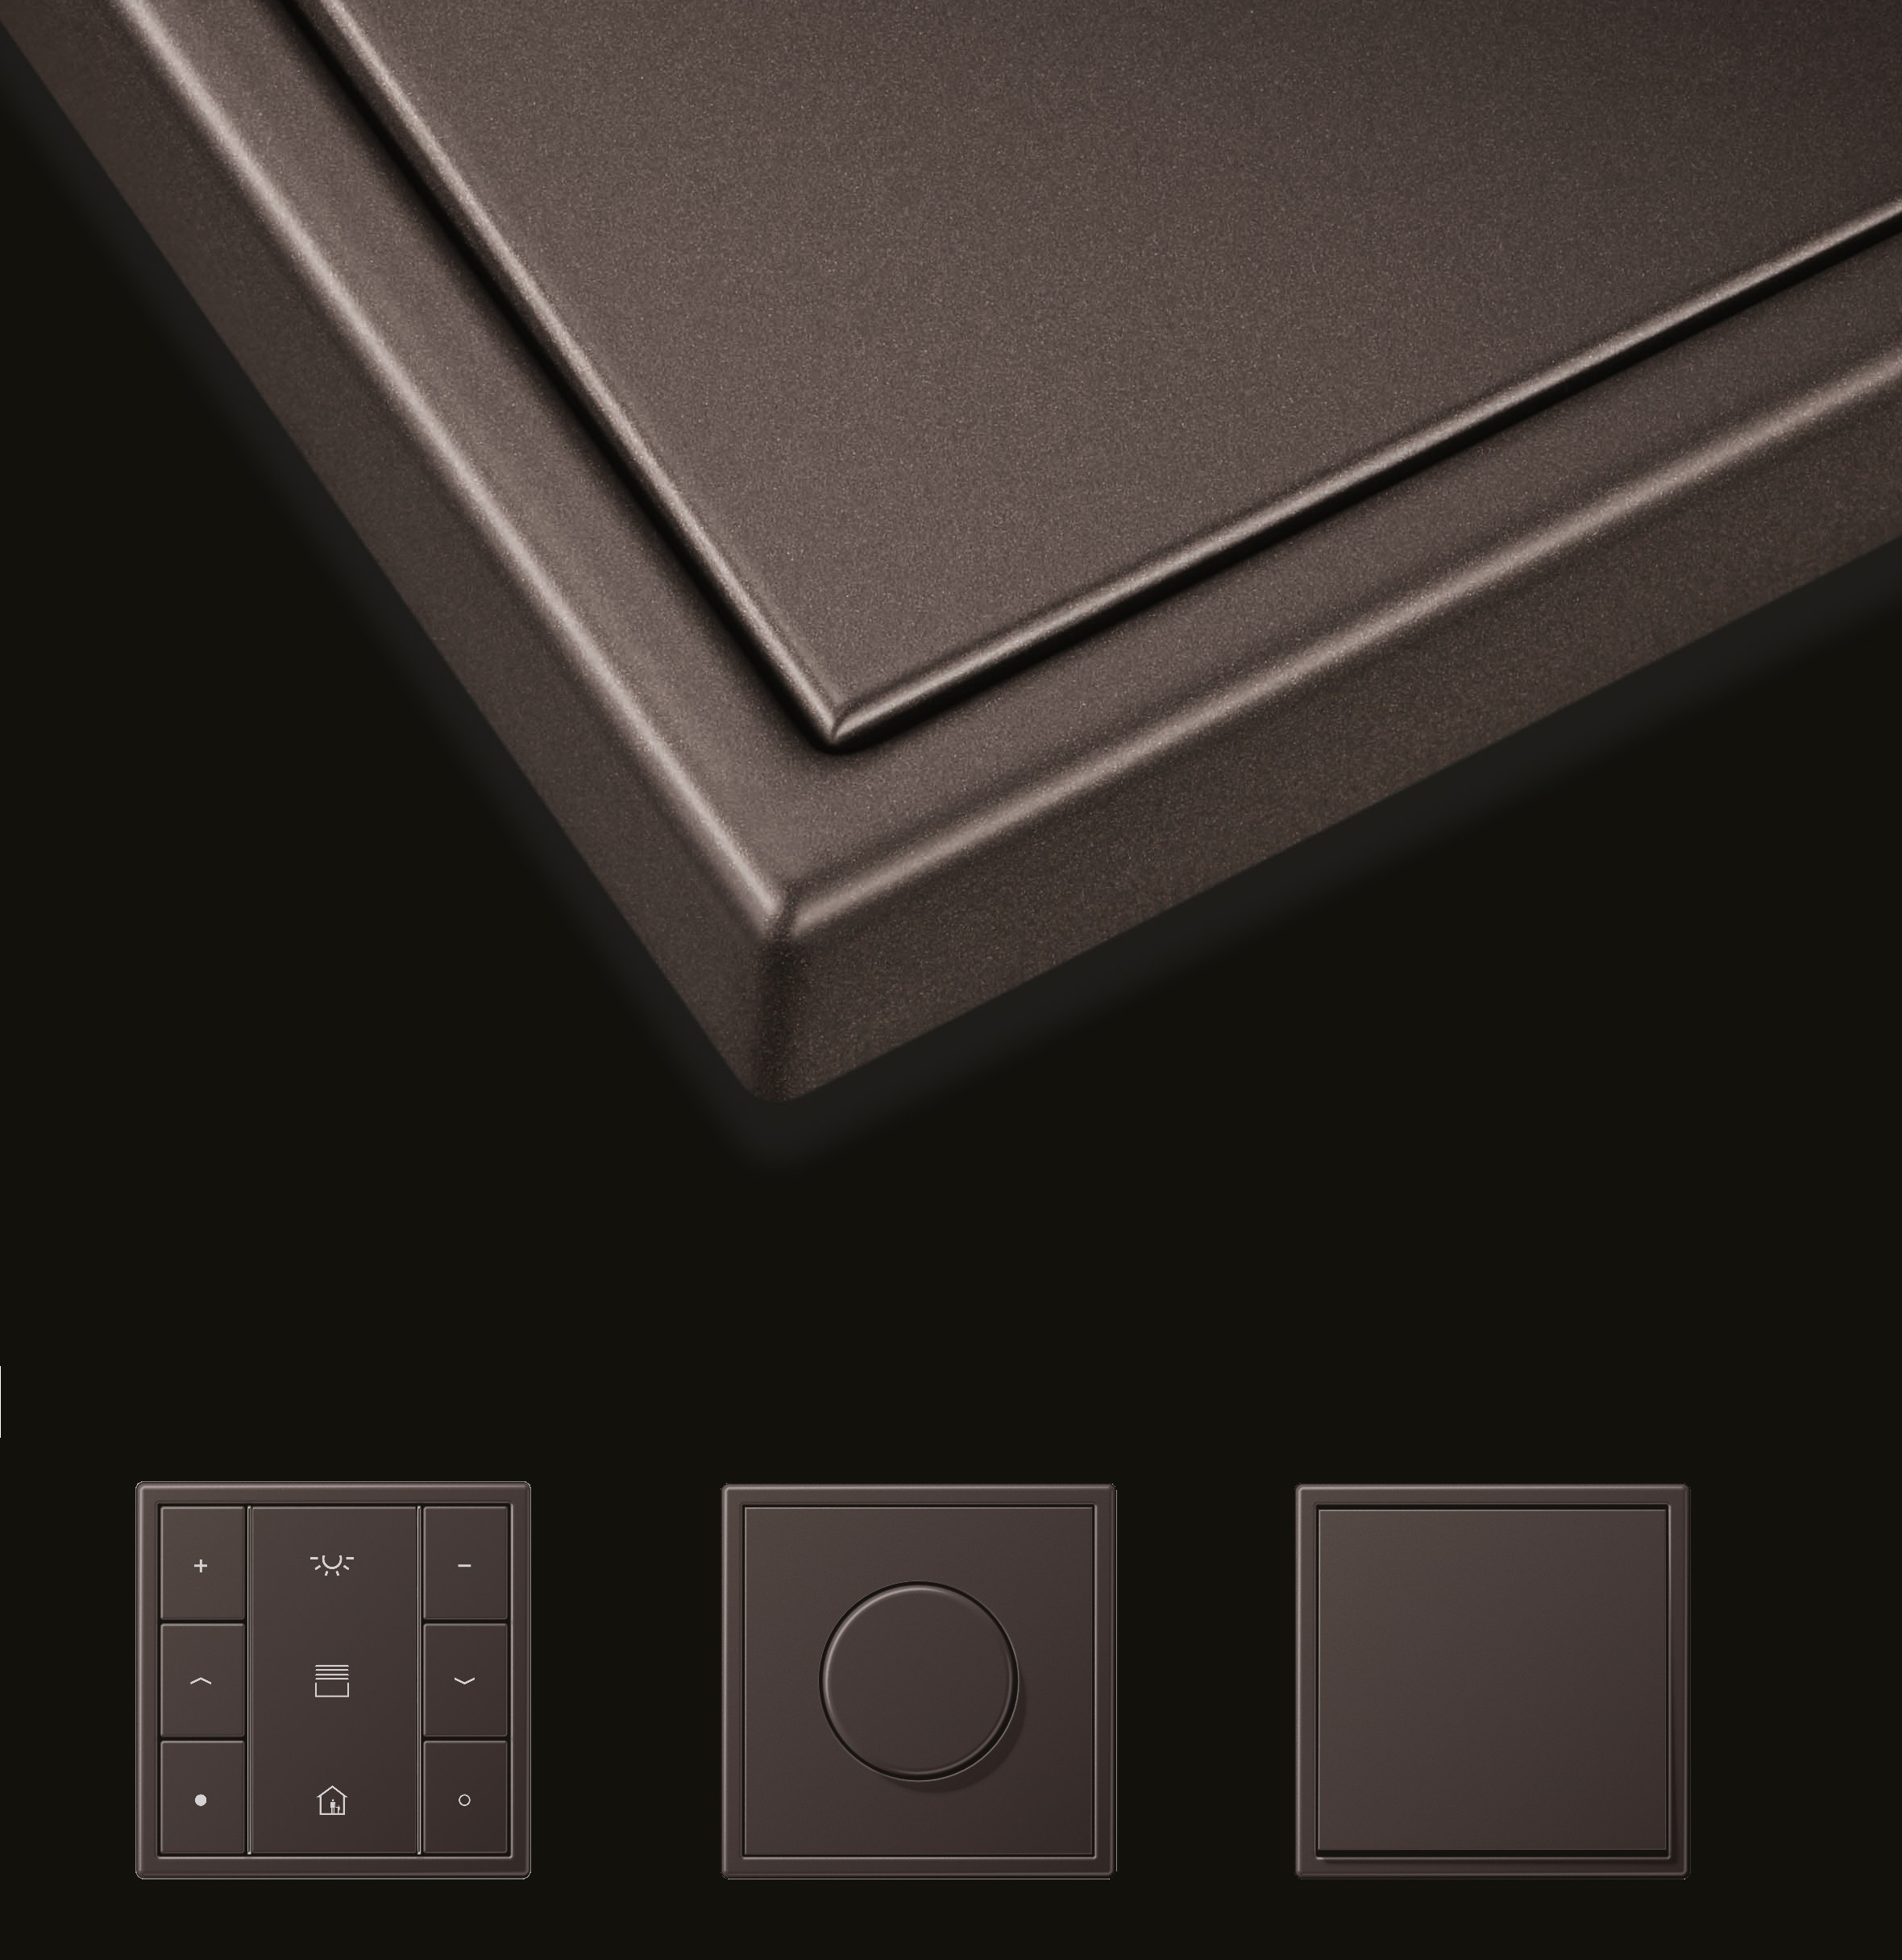 jung mat riel d 39 installation interrupteurs et prises de courant produits stagobel. Black Bedroom Furniture Sets. Home Design Ideas